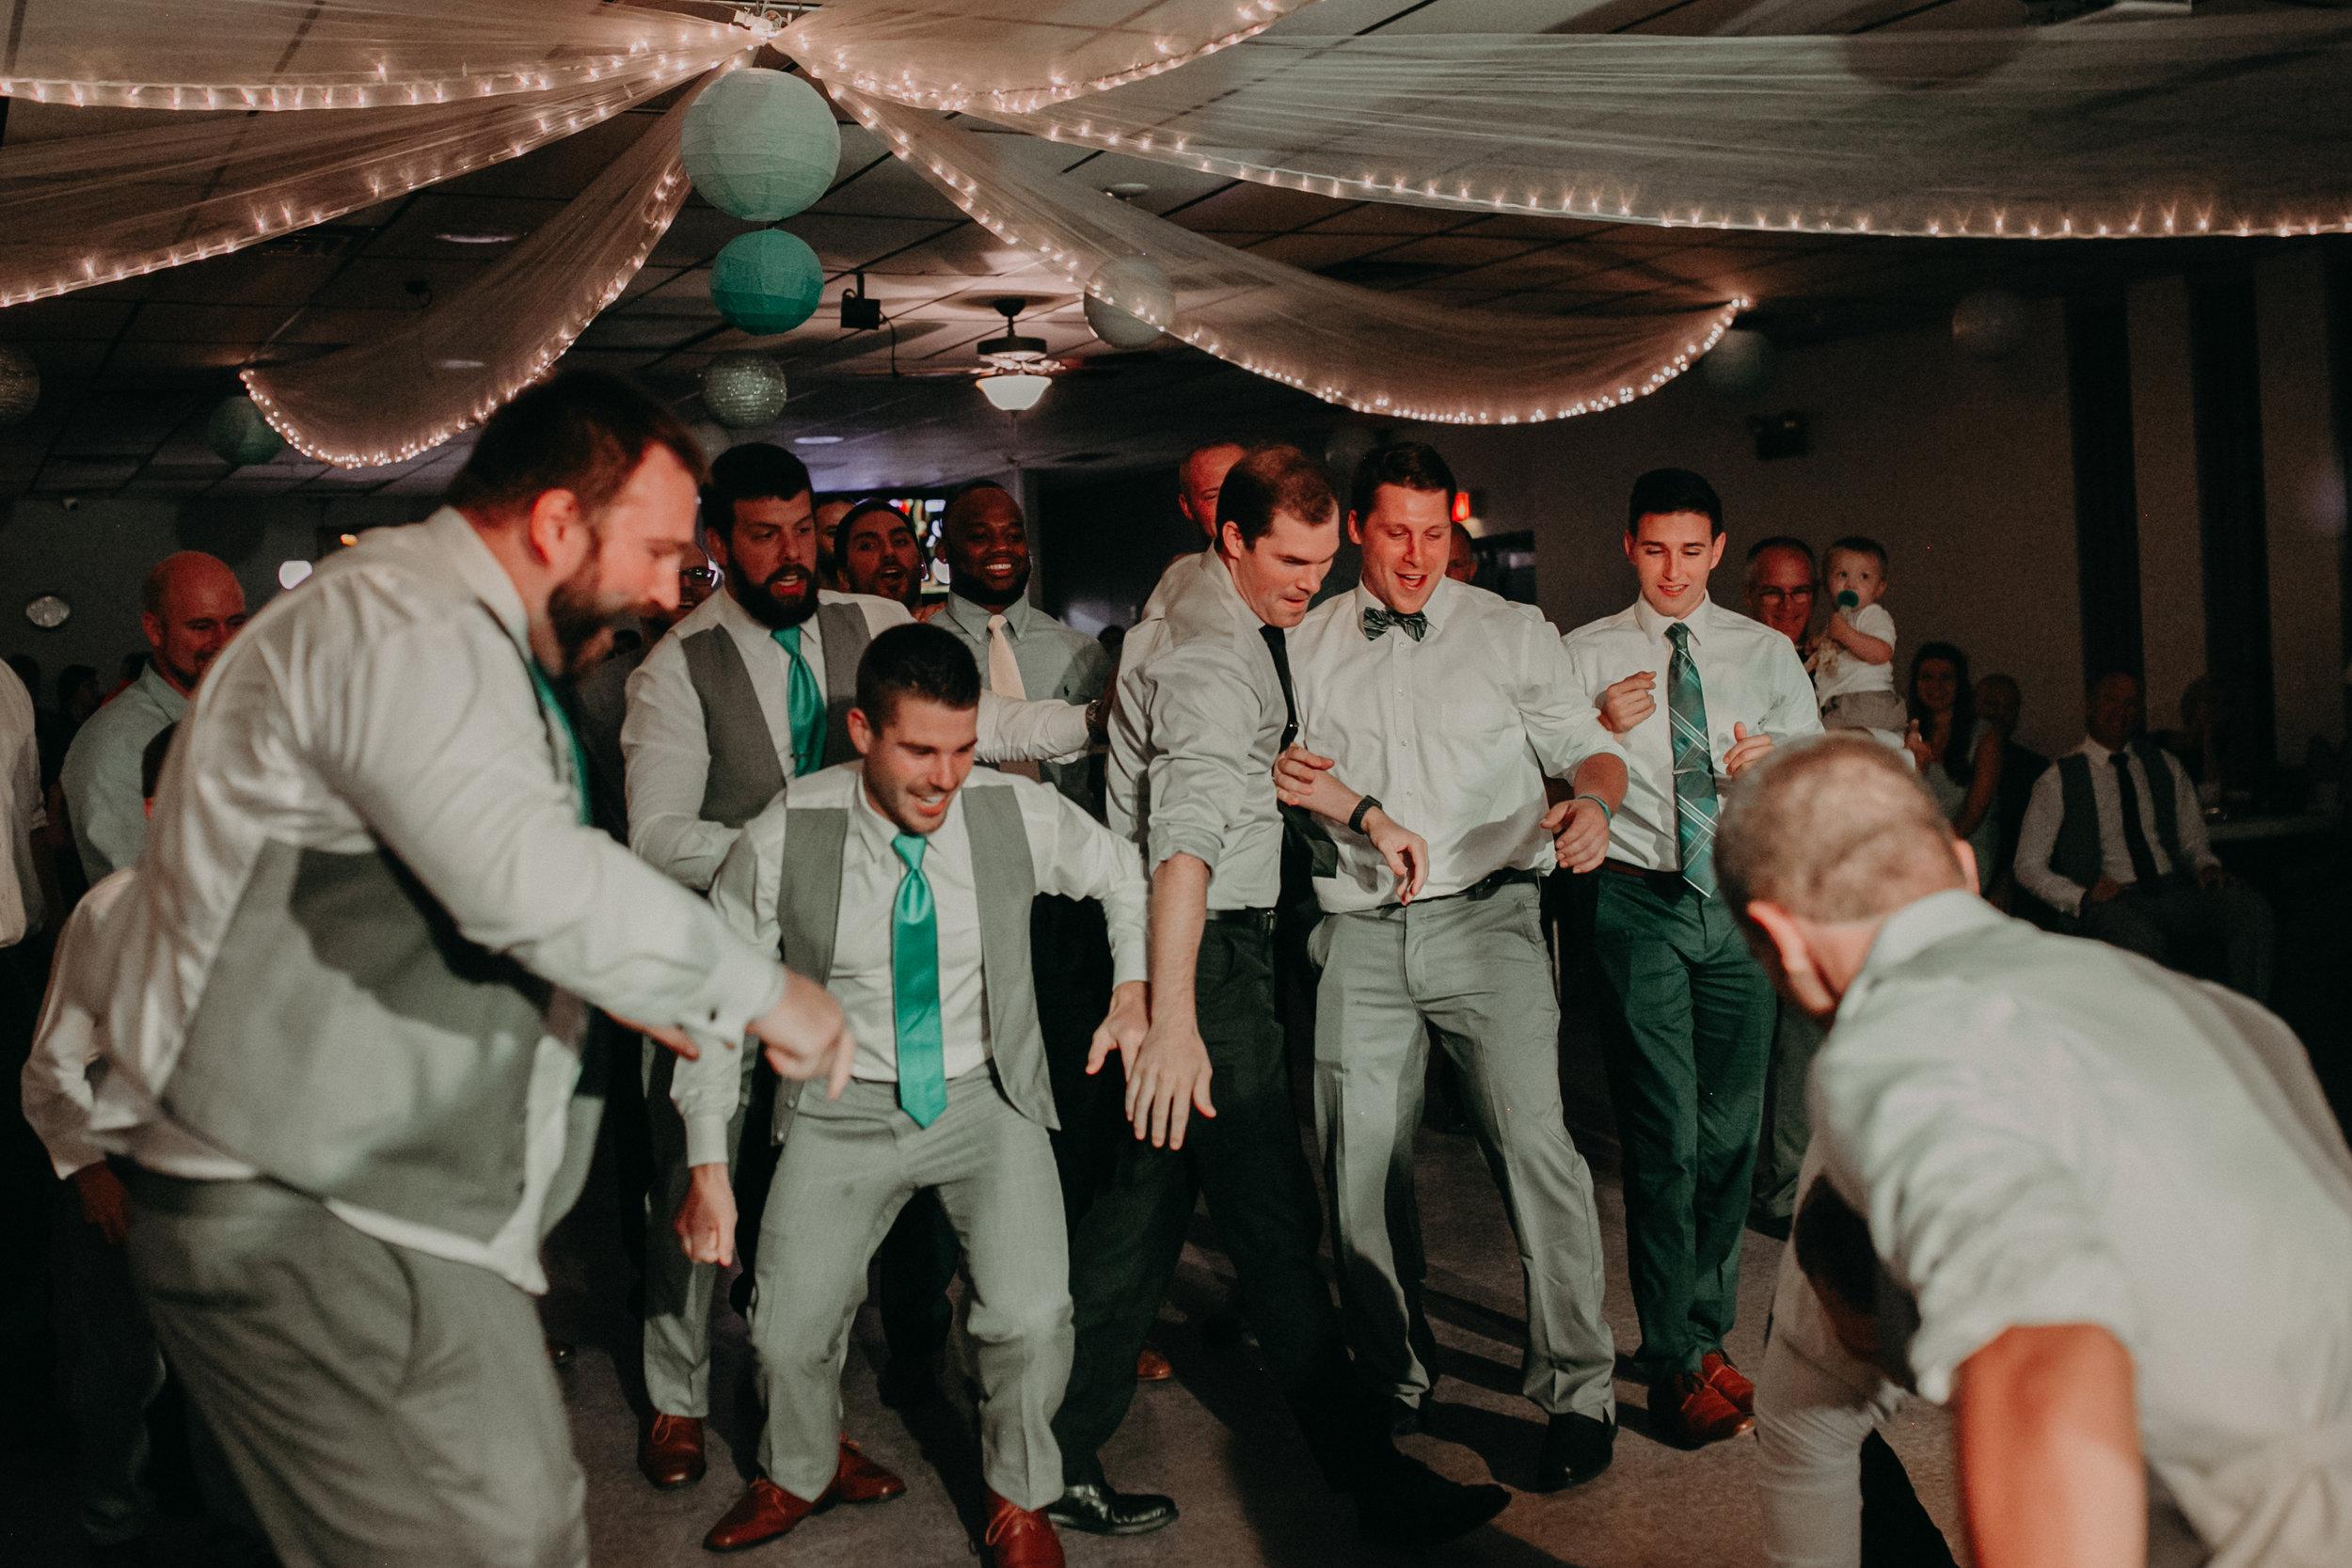 garter-toss-eagles-club-marshfield-wi-wedding